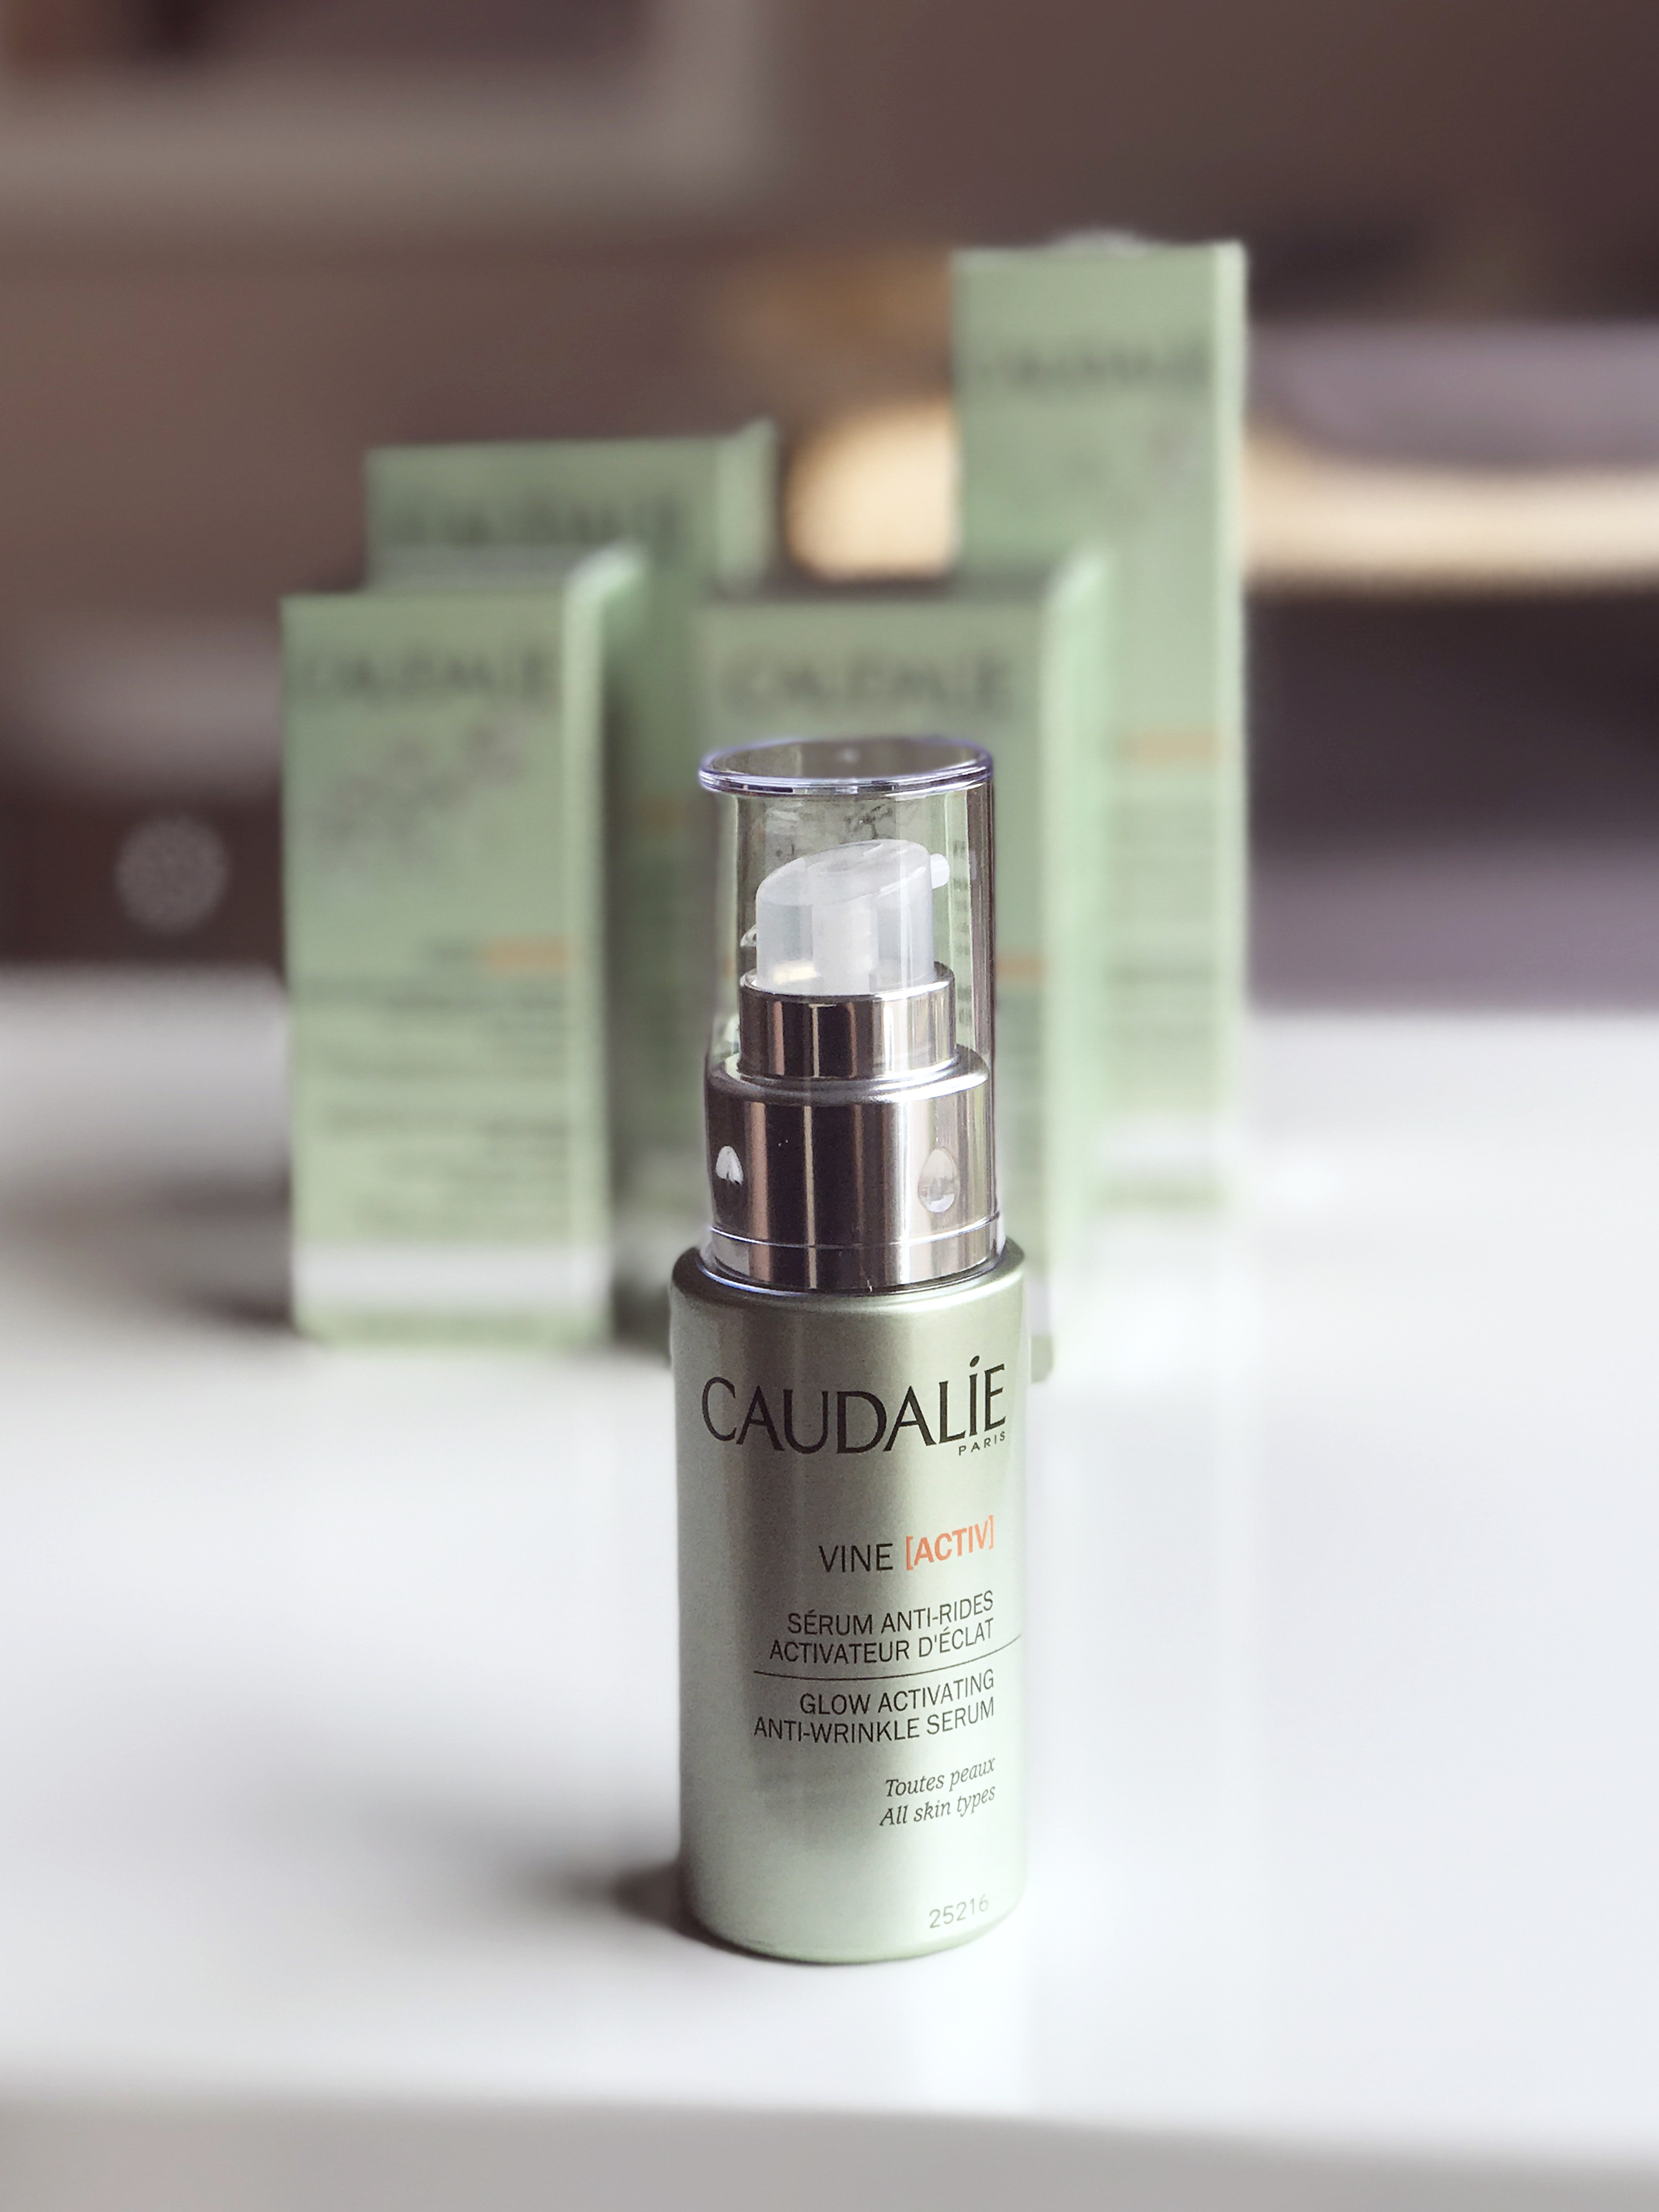 Caudalie Glow Activating Anti-Wrinkle Serum